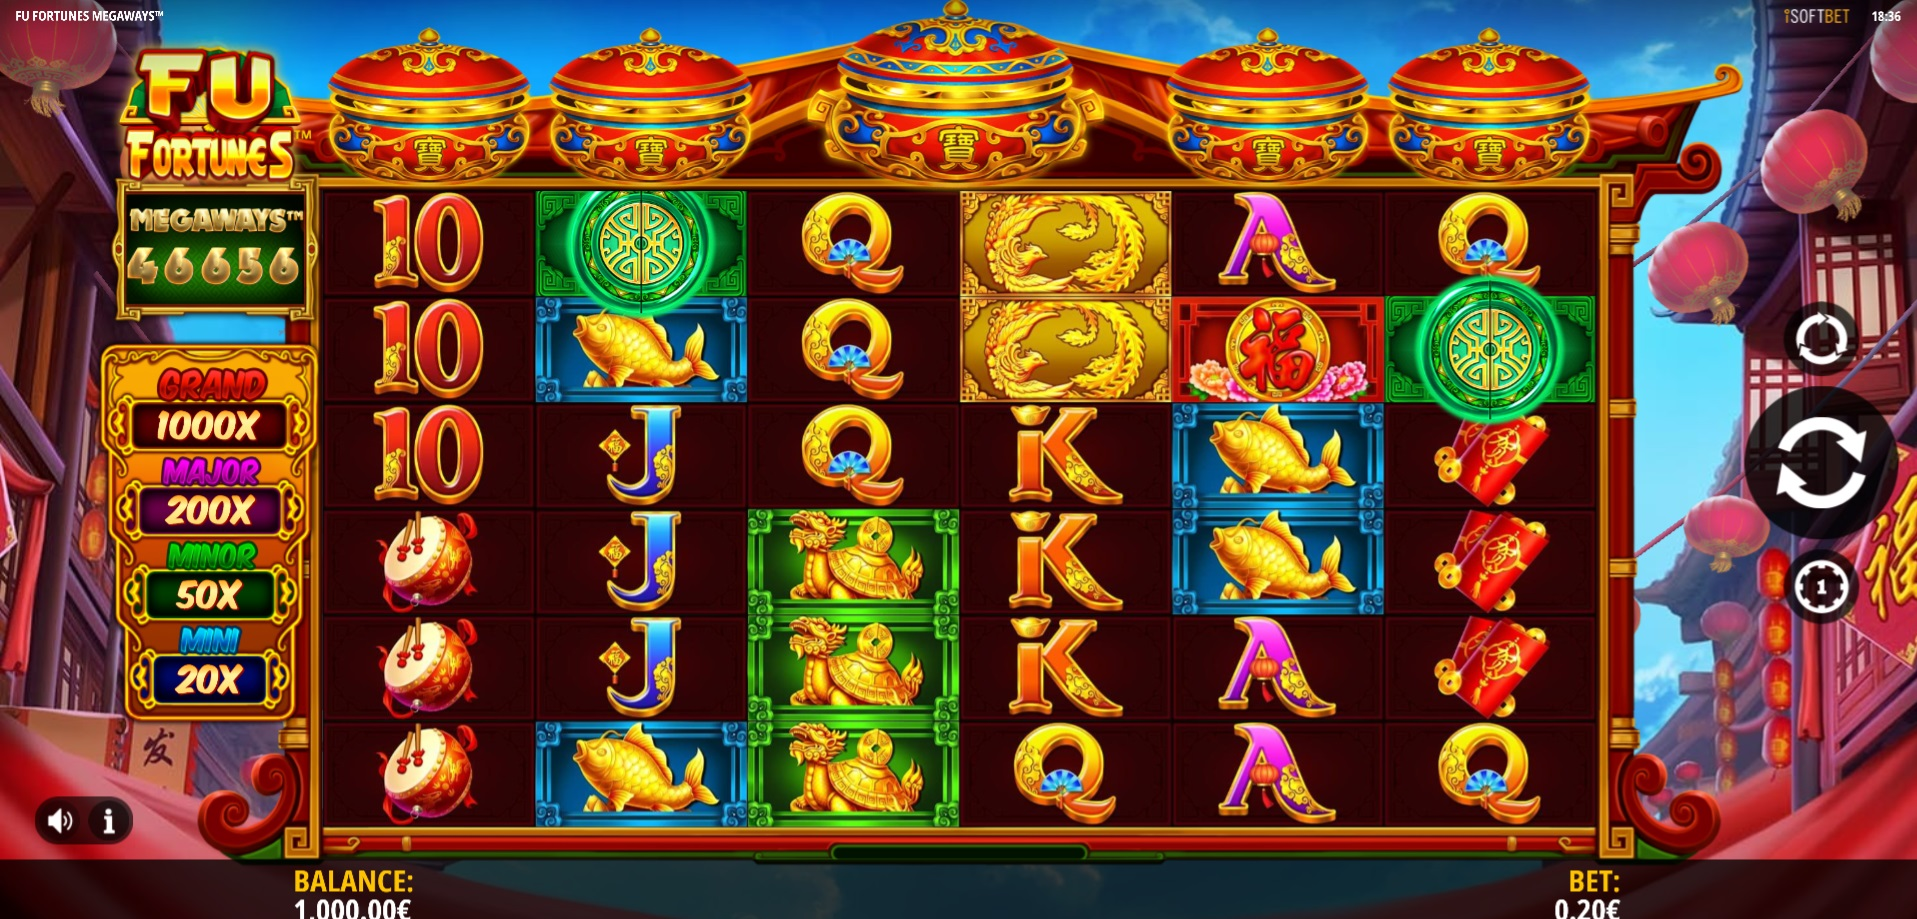 Fu Fortunes Megaways Main game reels